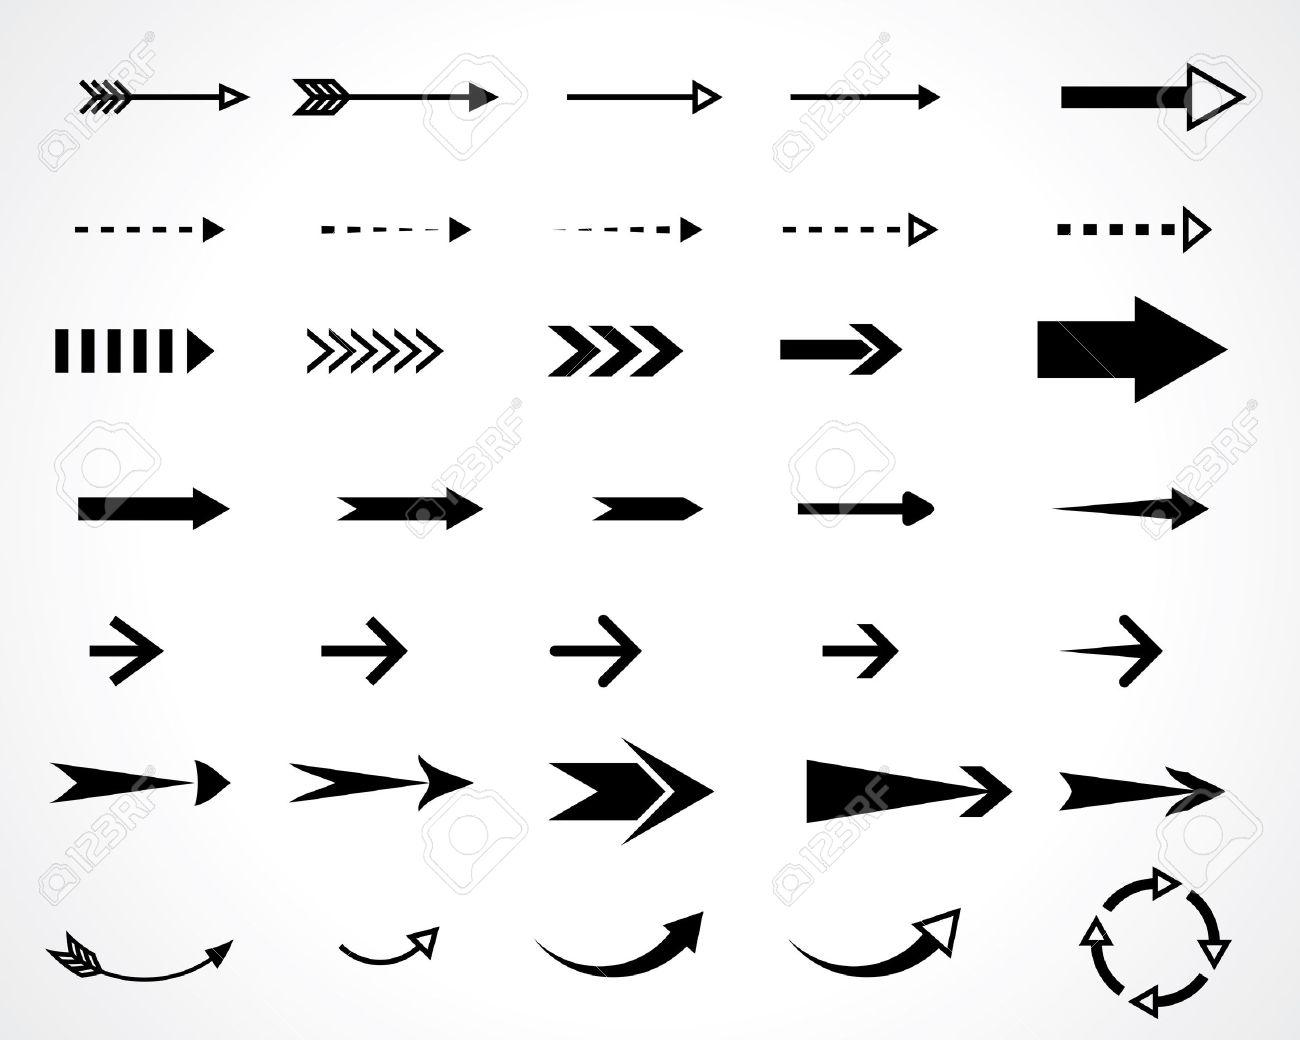 arrows. vector design elements set. eps8 - 32844934